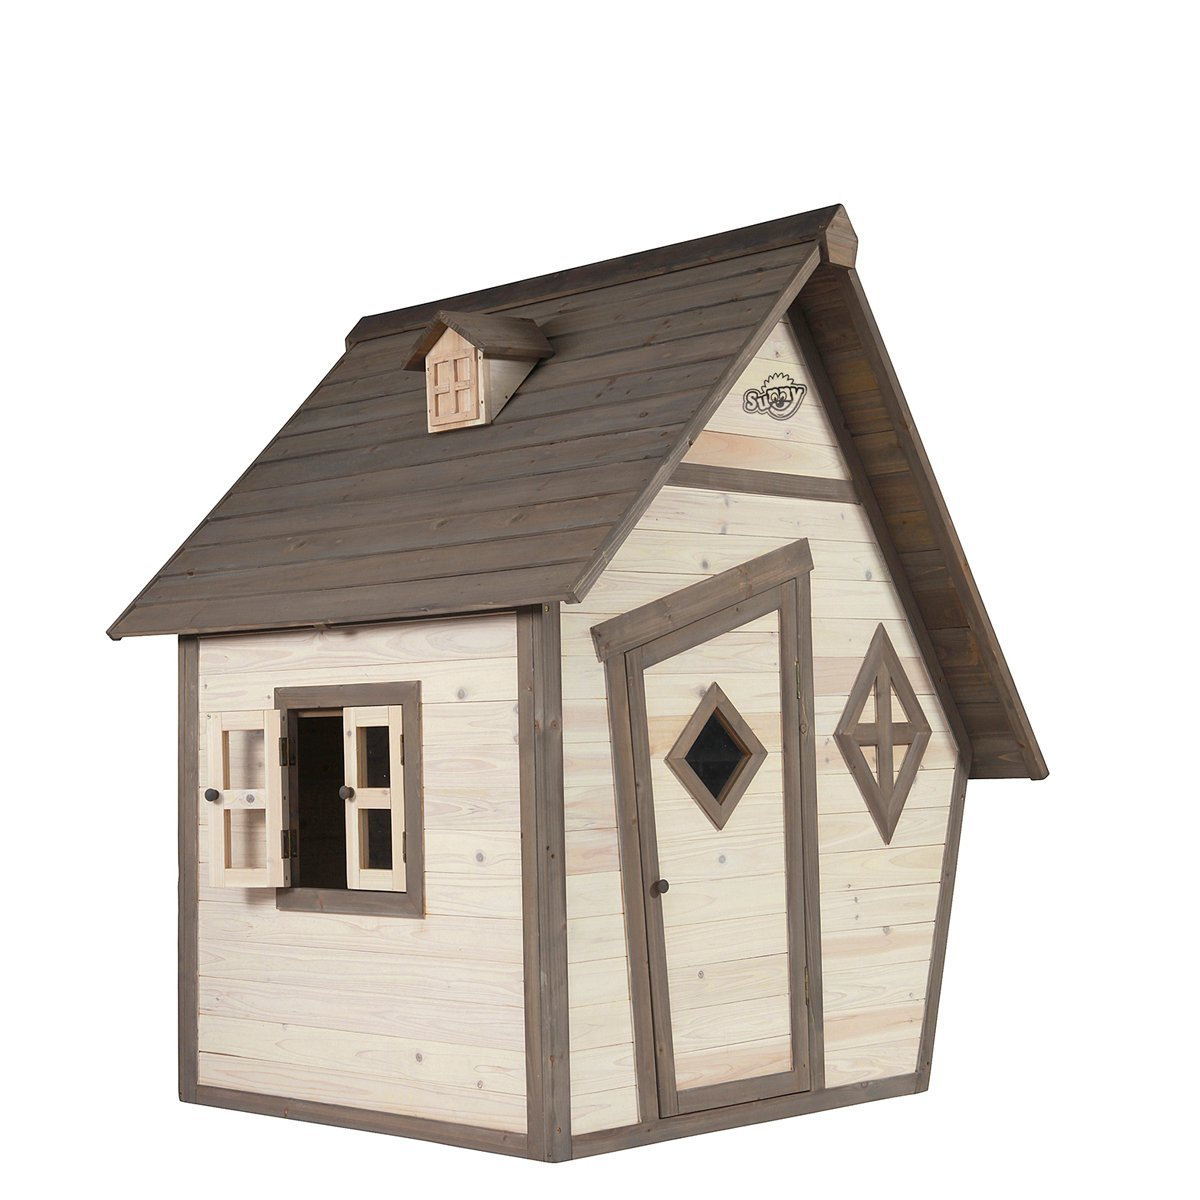 Sunny Kinder Spielhaus Cabin